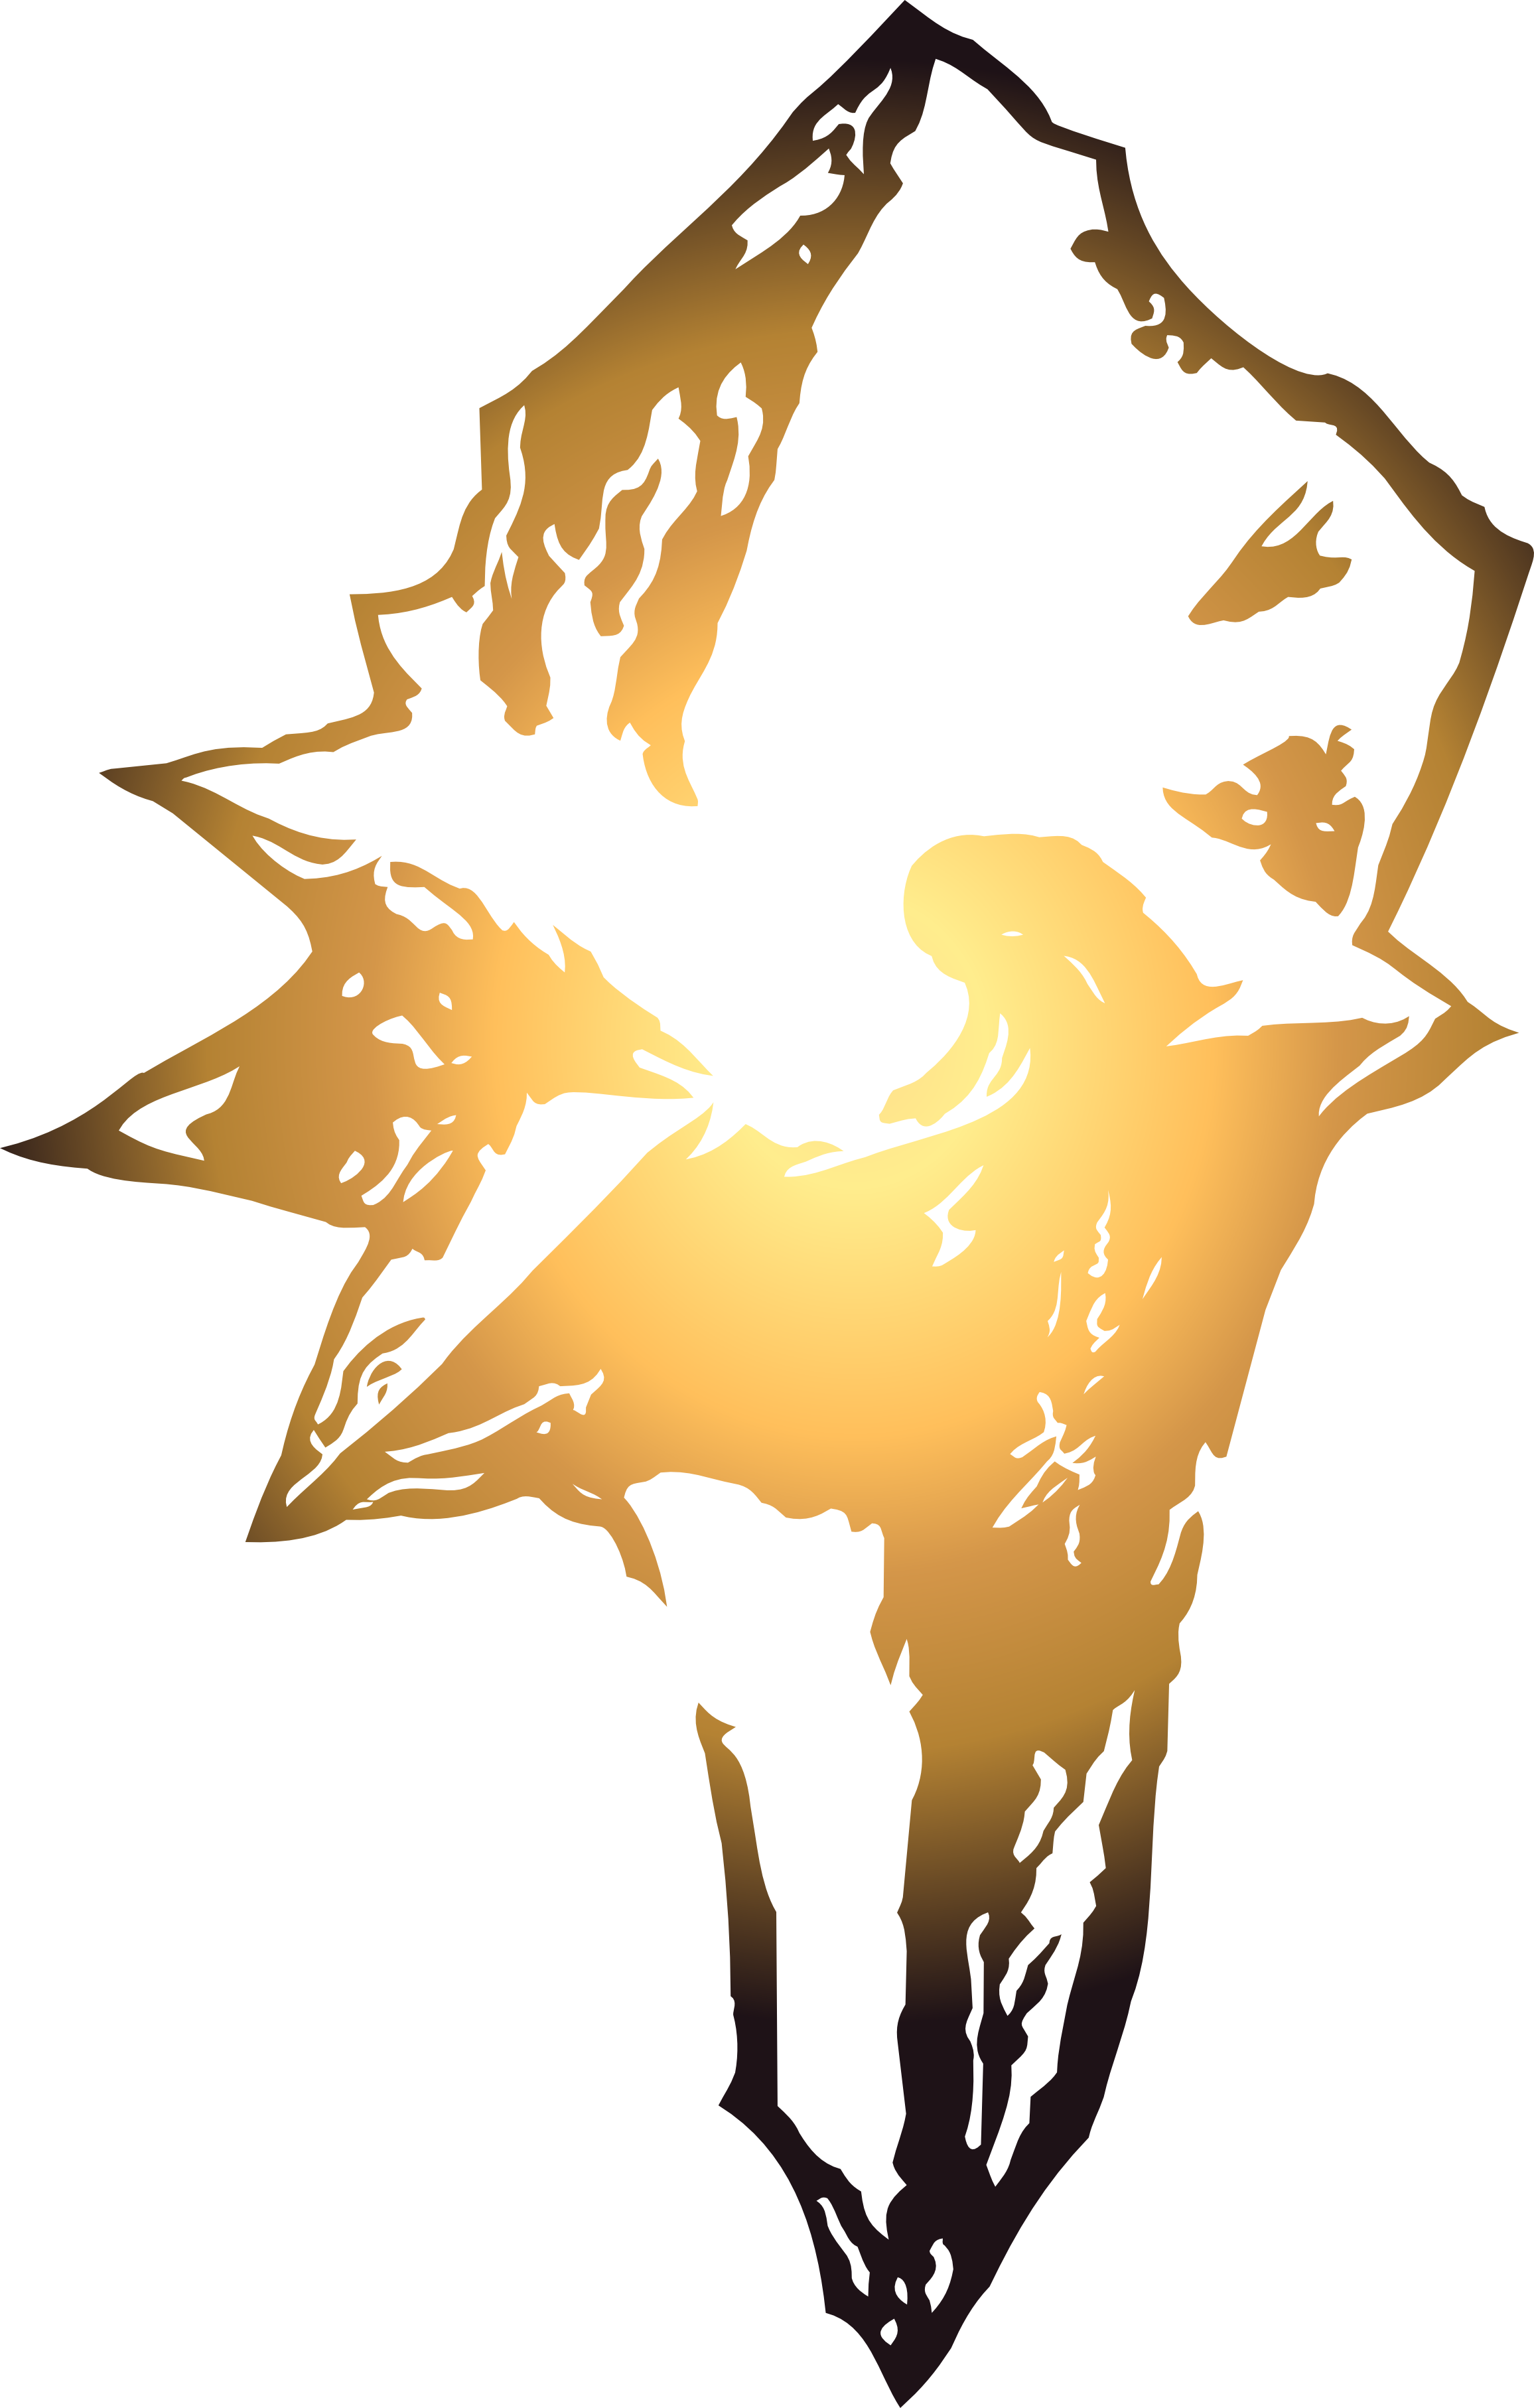 Final Fantasy IX logo by on